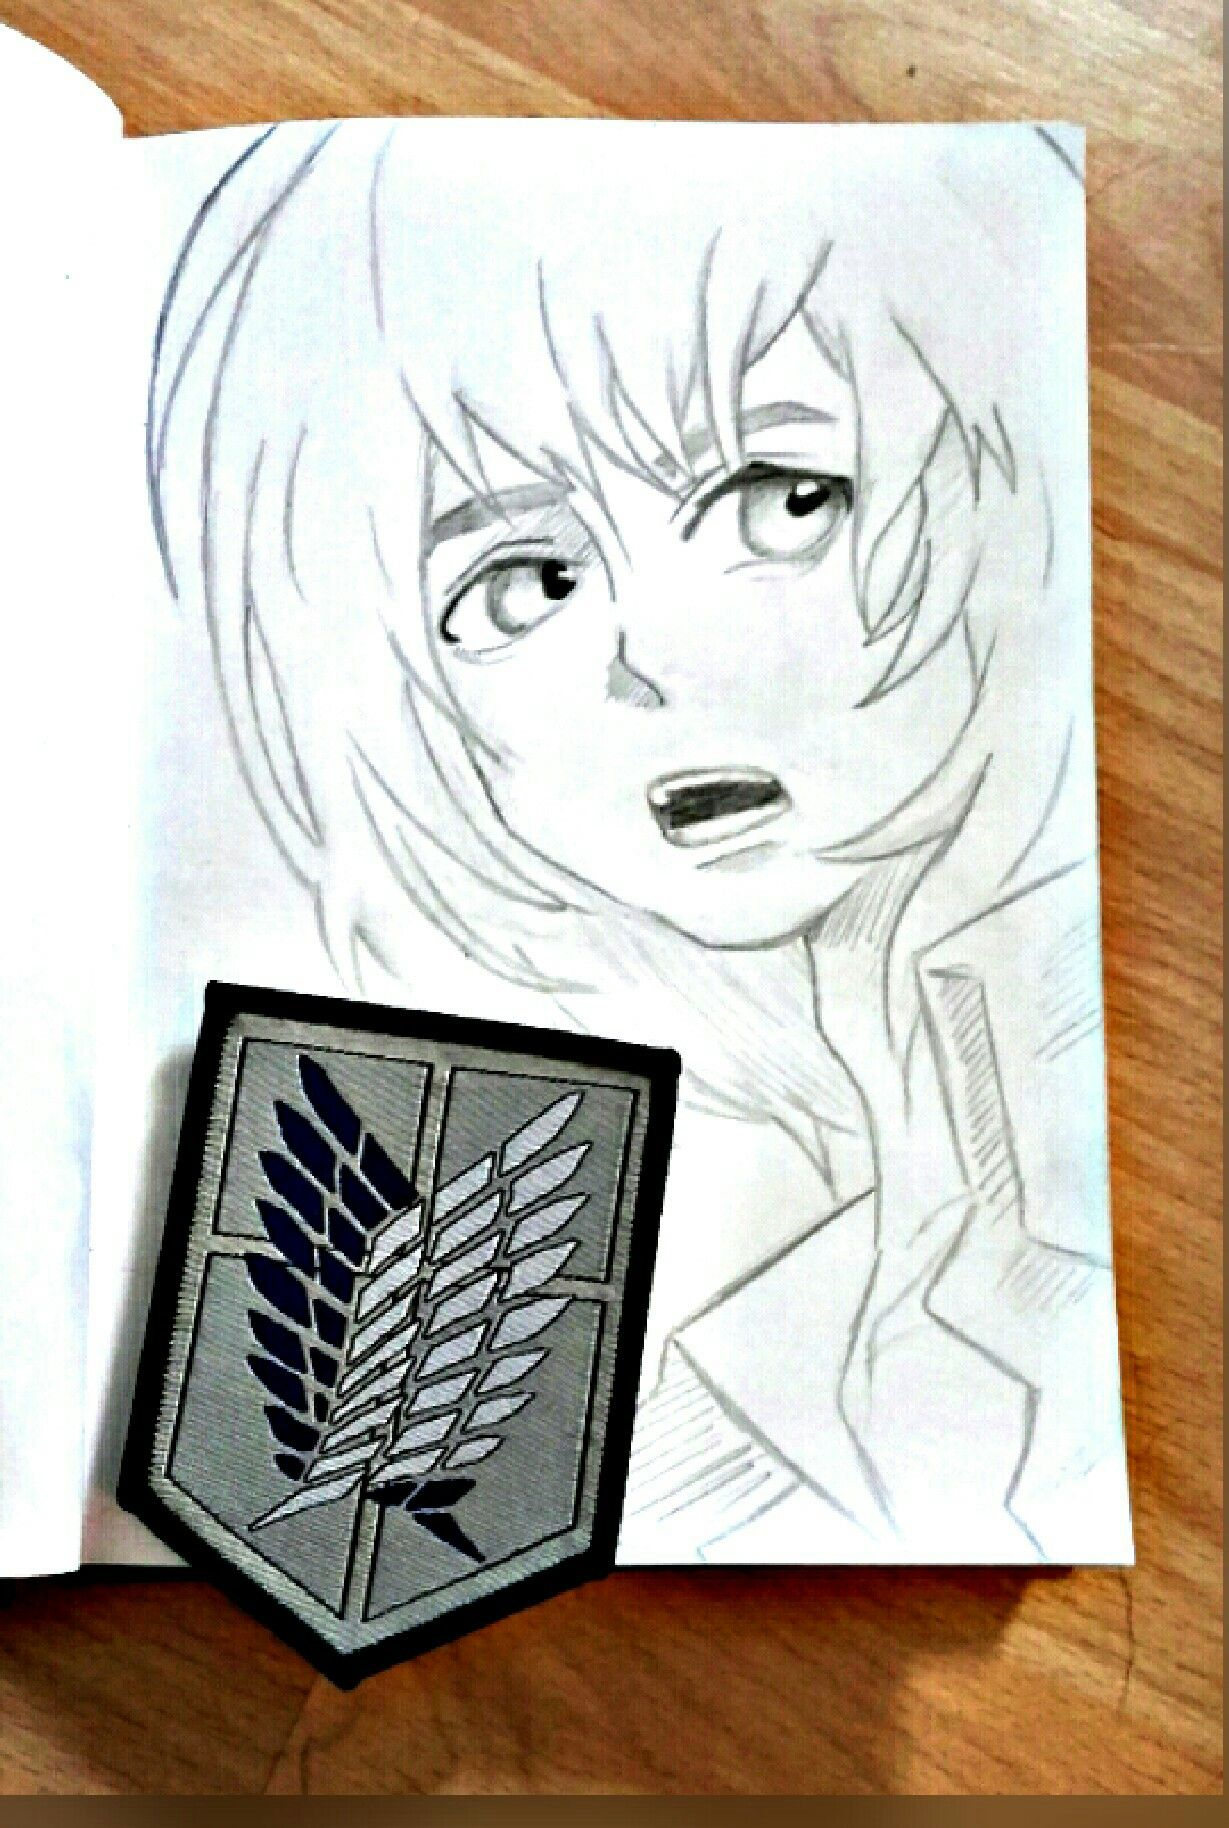 """I'll sooner die than become burden."" - Armin Arlert."